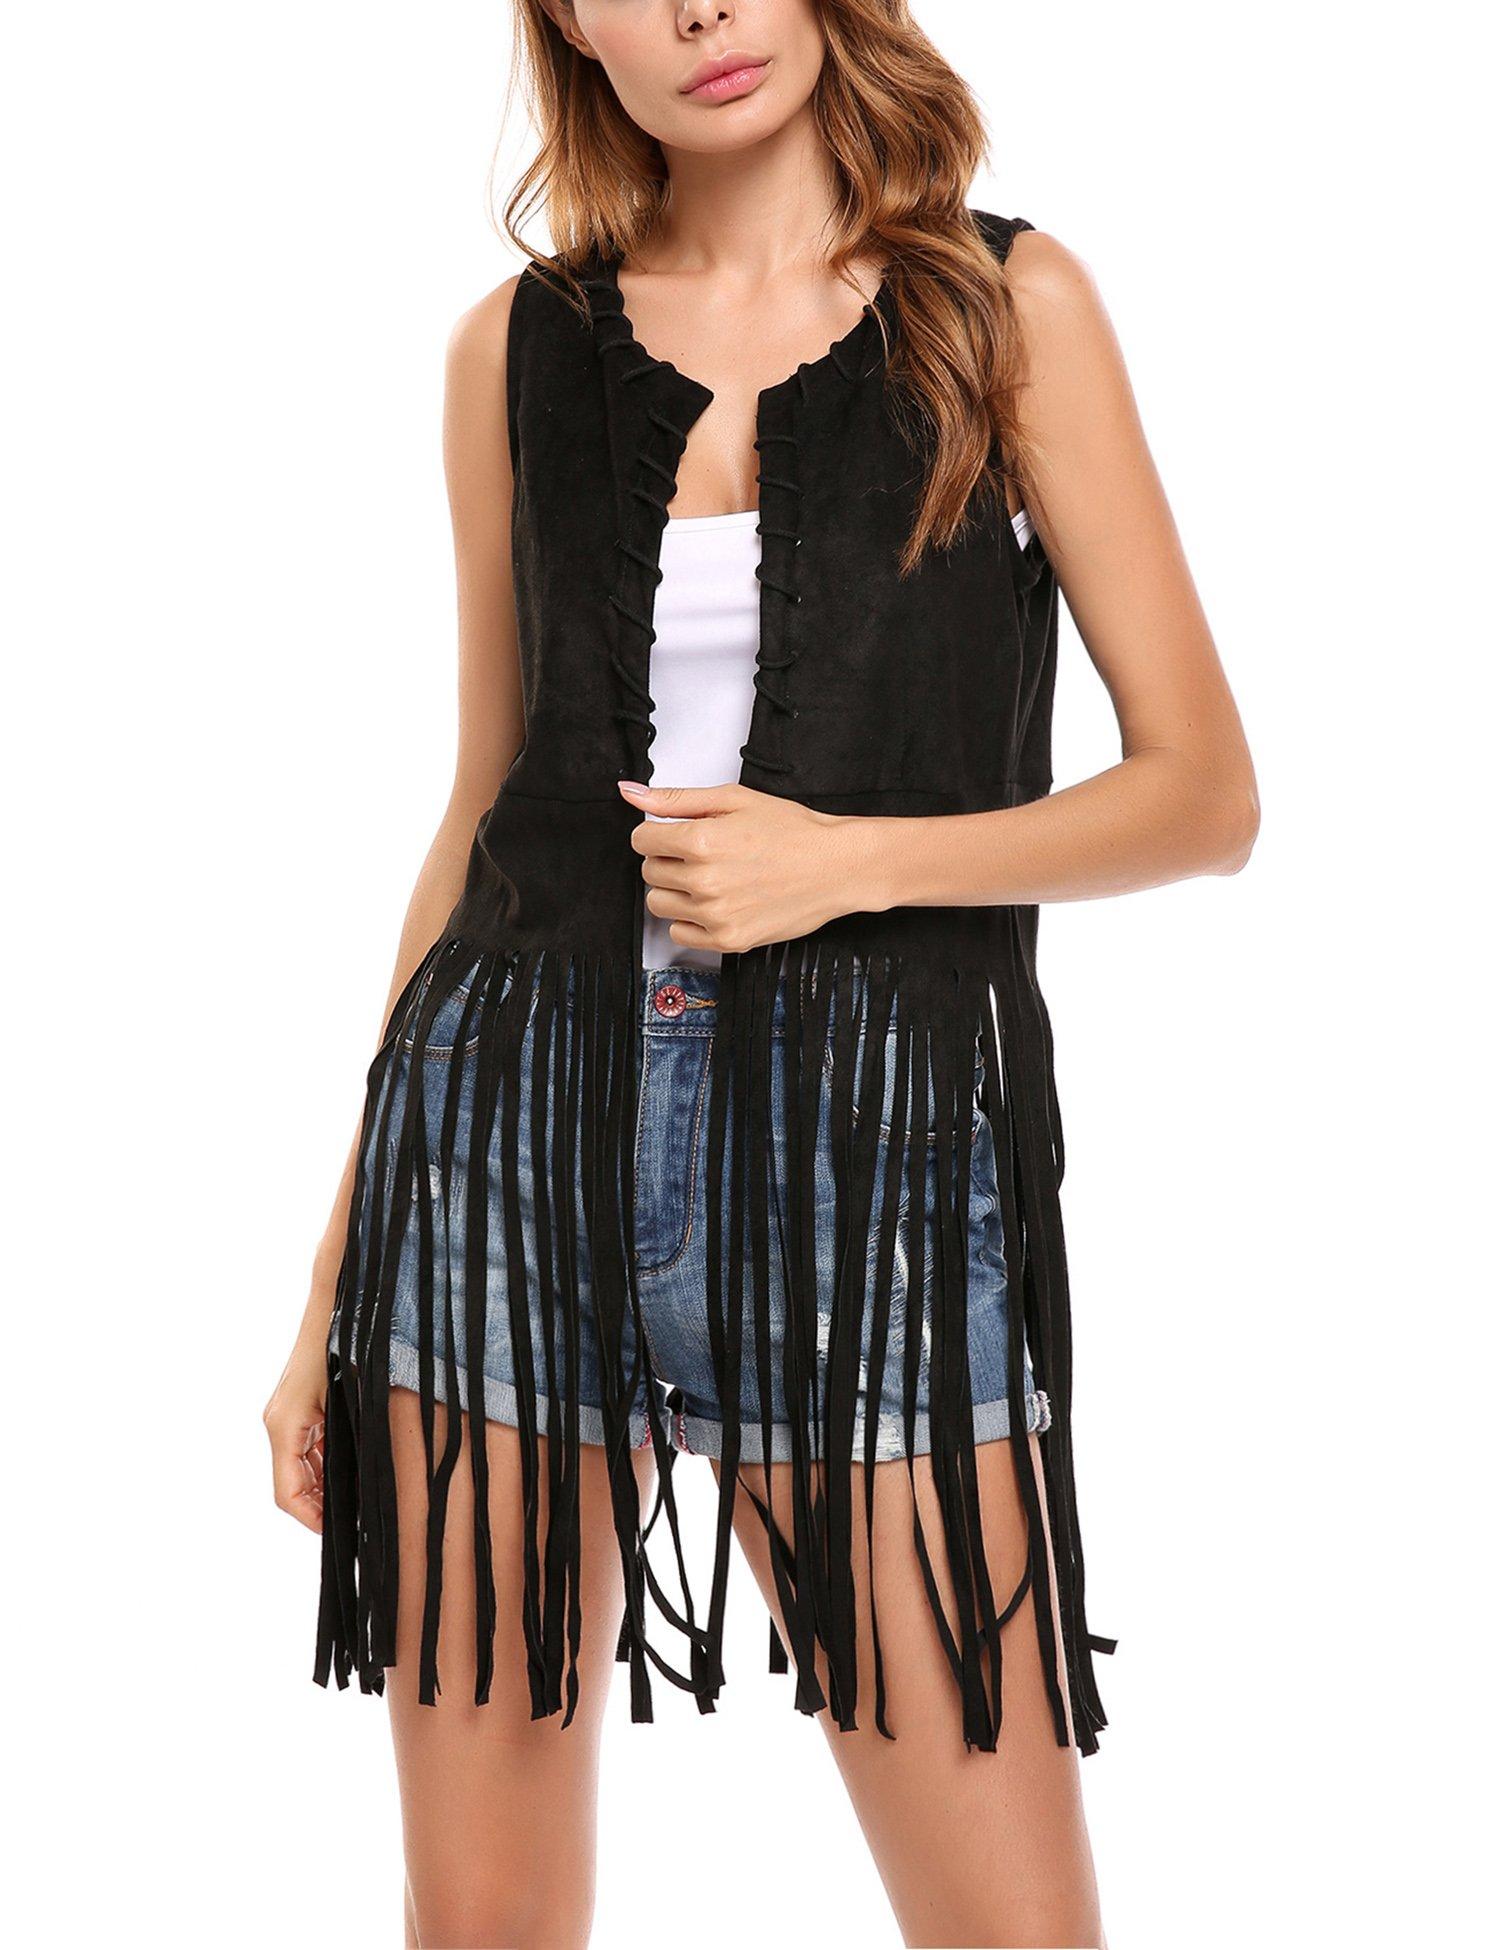 Hotouch Women Fringe Vest Open-Front Faux Suede Sleeveless Tassels Vest Cardigan Black XXL